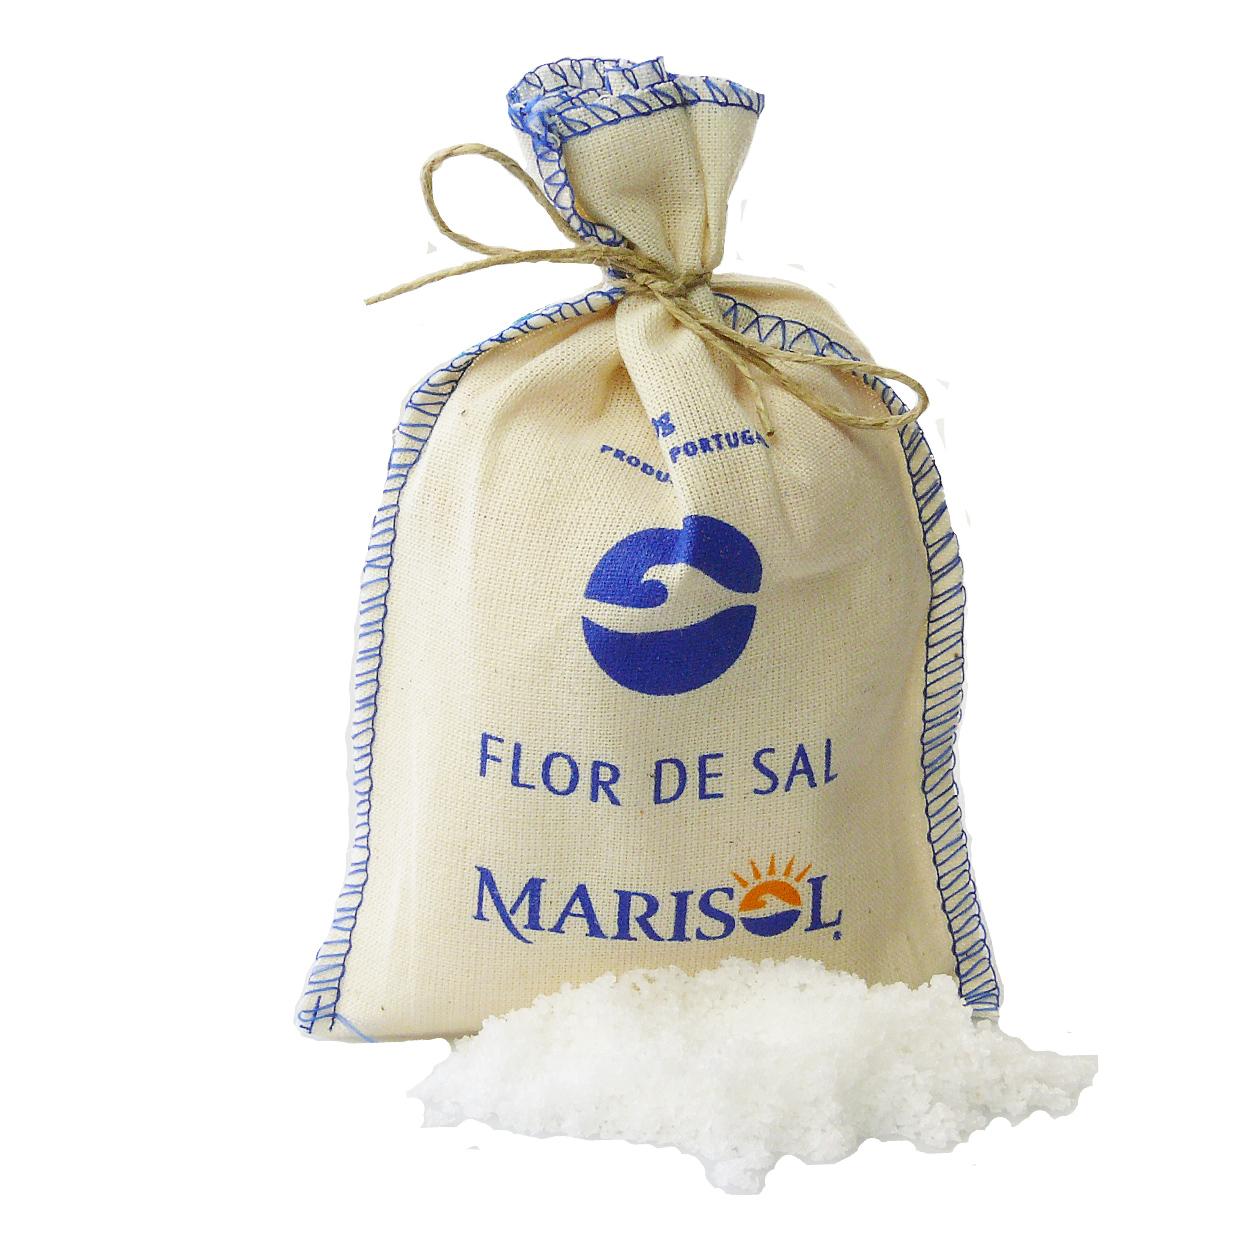 Flor De Sal Von Marisol Bei Salmundocom Online Bestellen